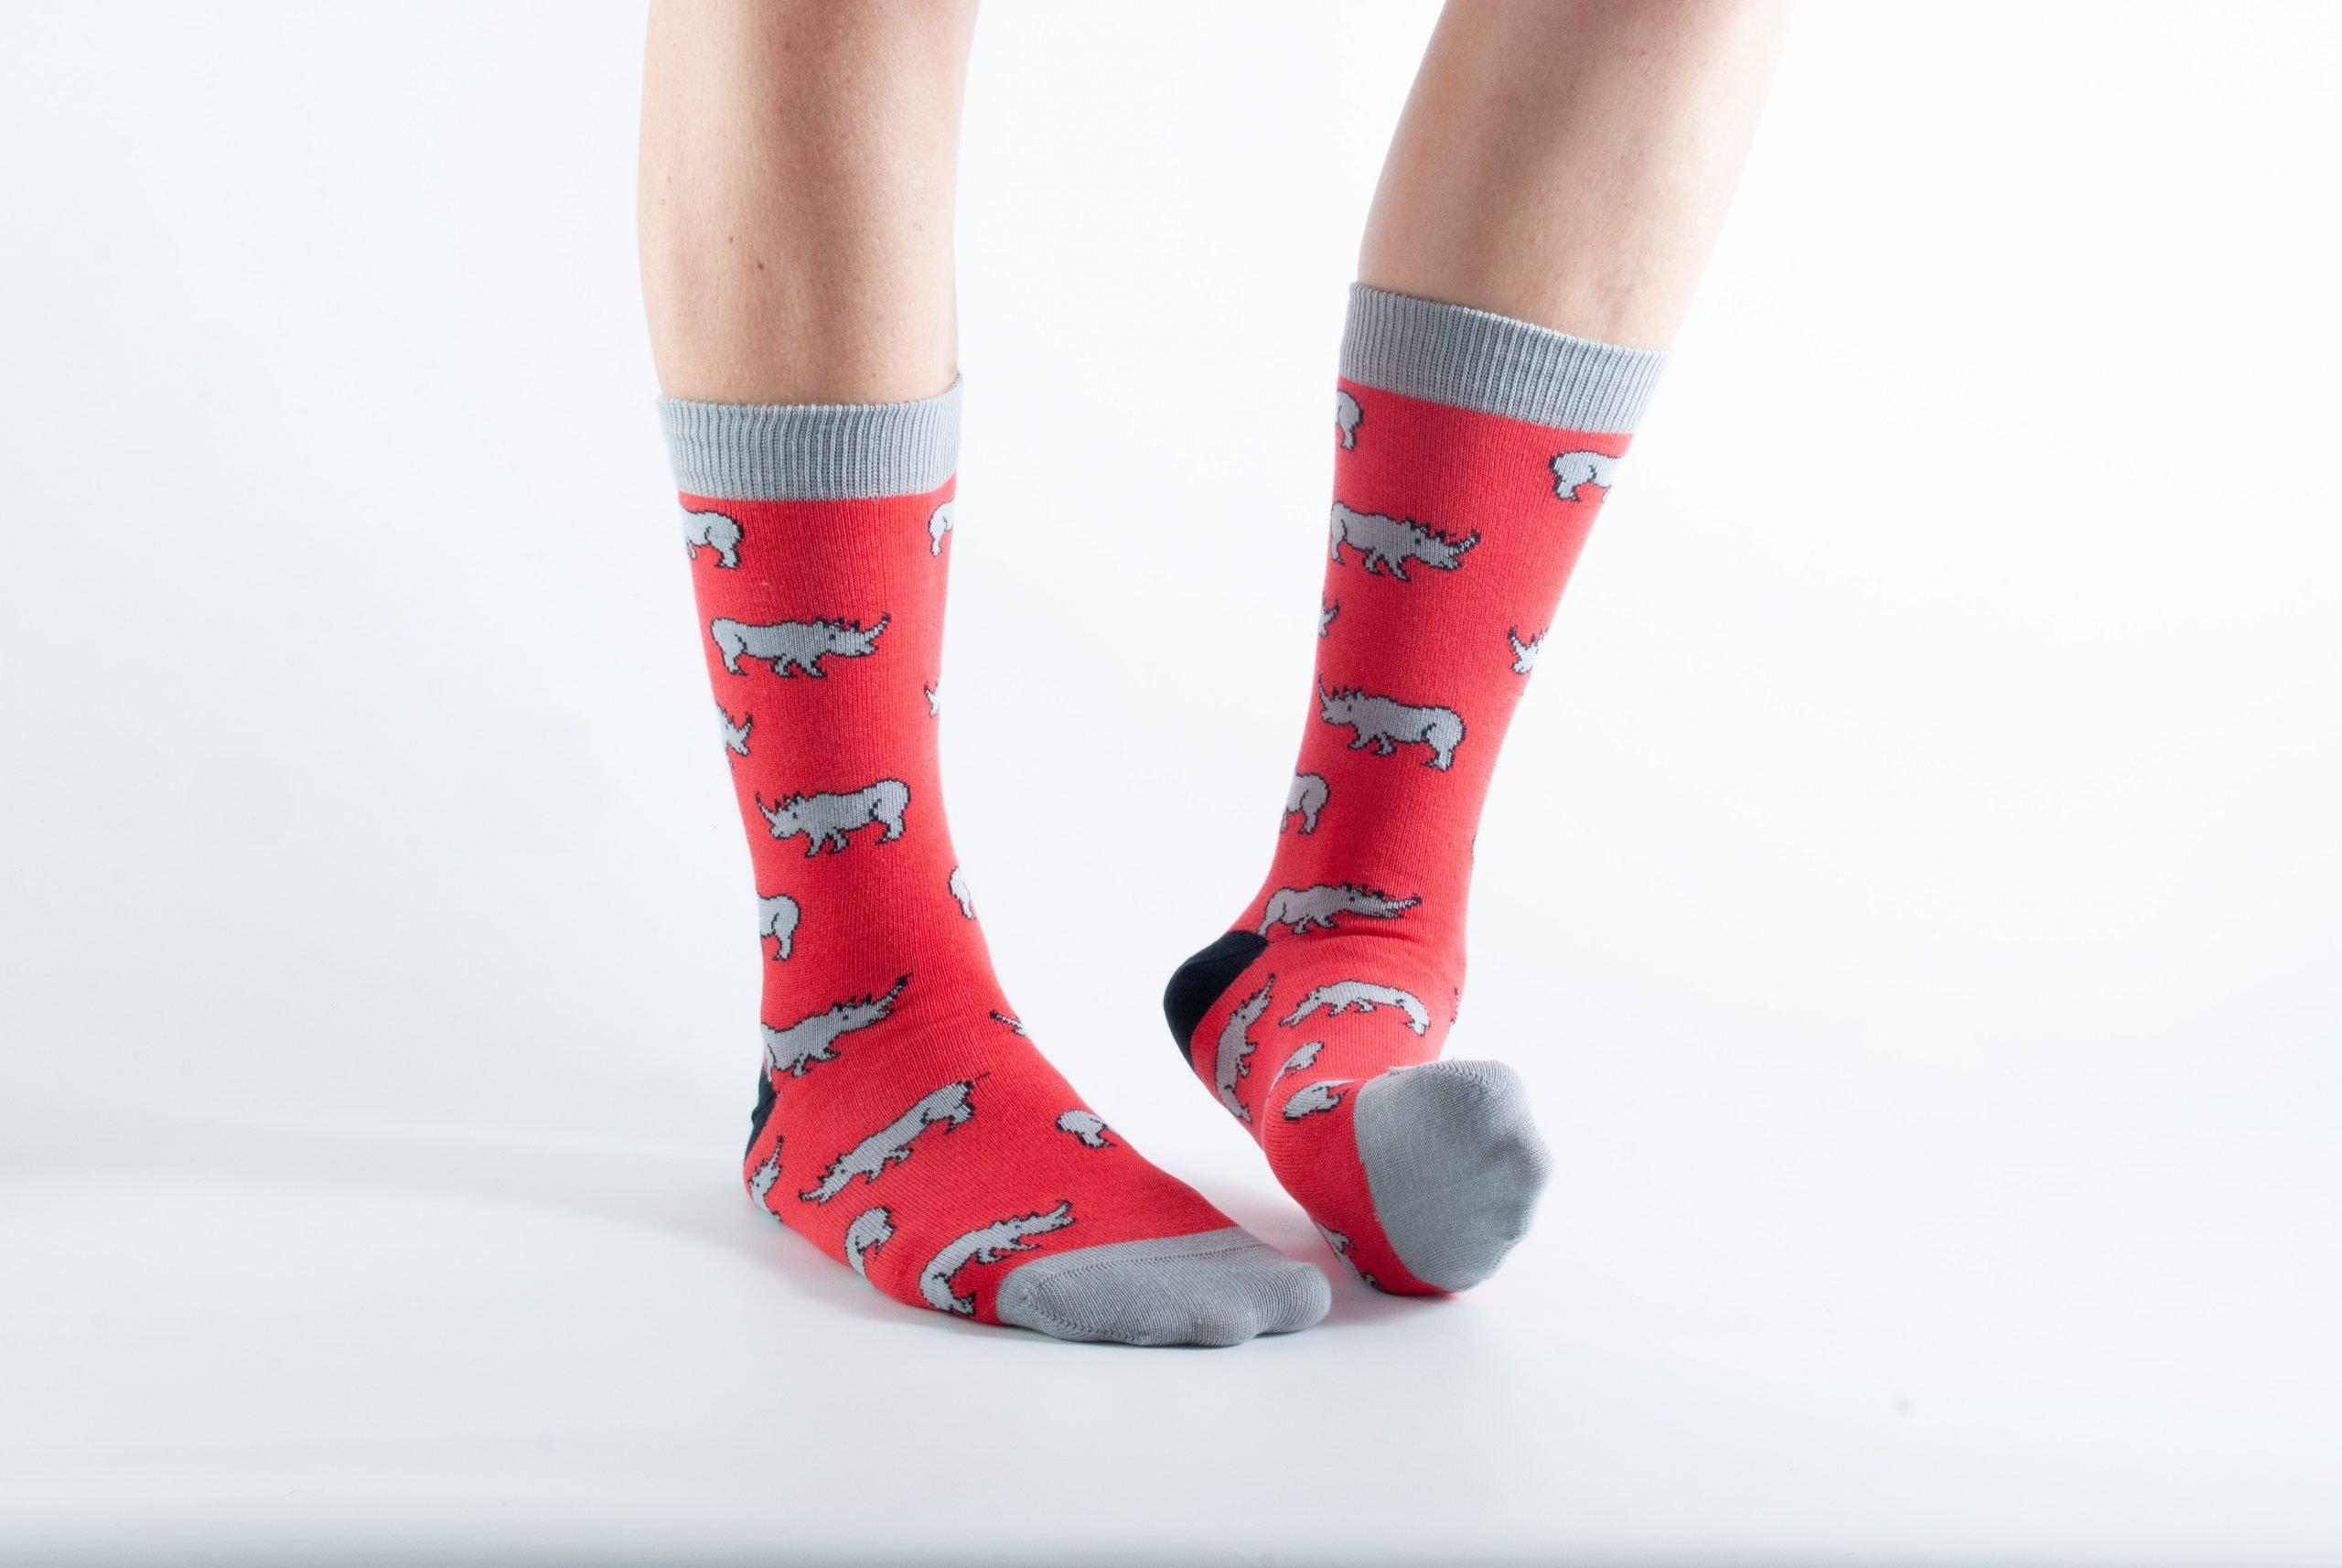 Womens Rhino bamboo socks - red and grey